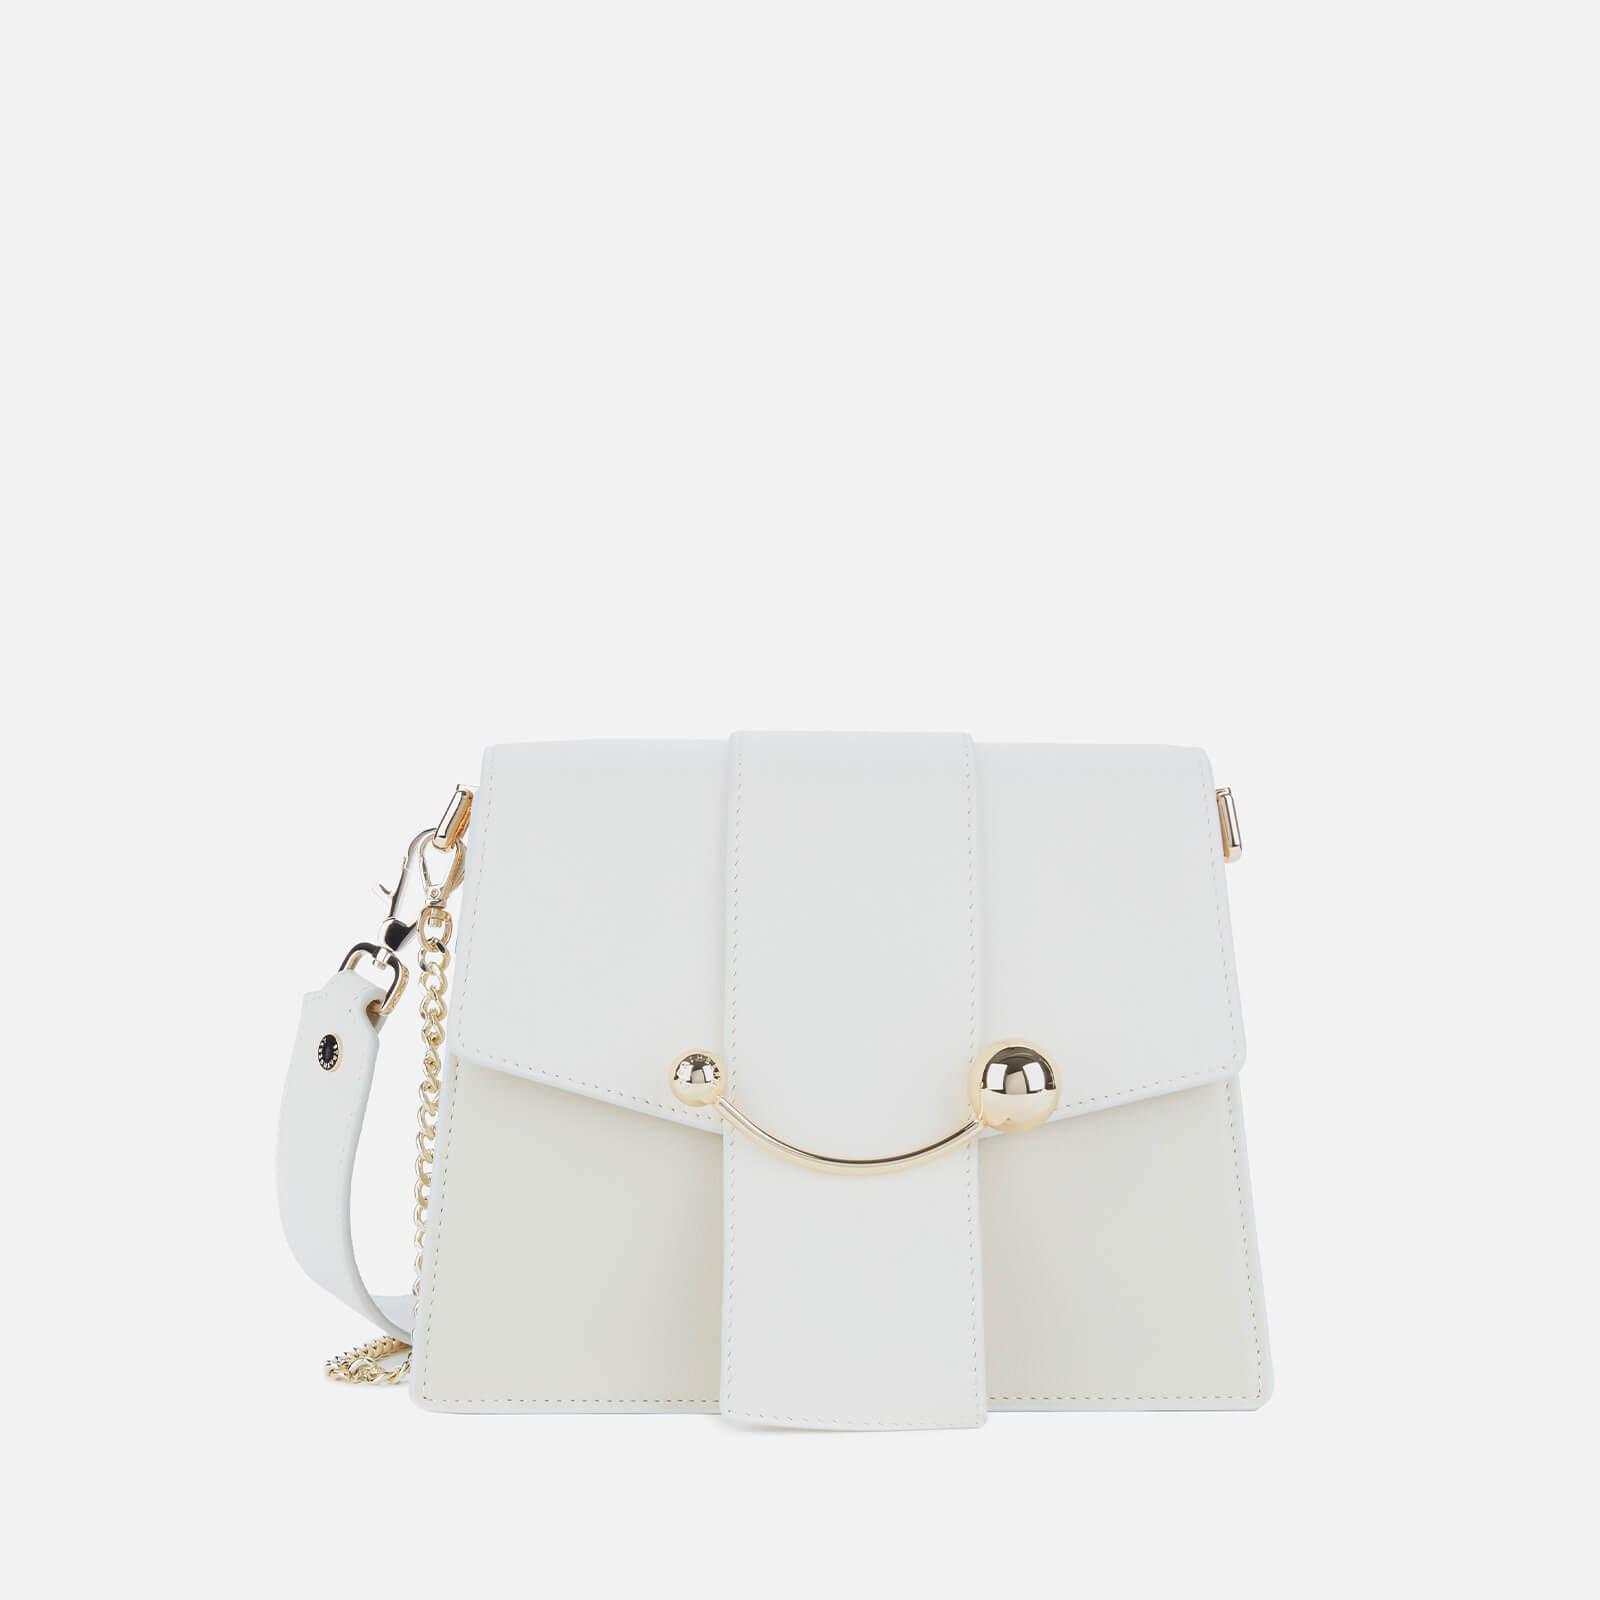 Strathberry Women's Box Crescent Shoulder Bag - Vanilla/Diamond